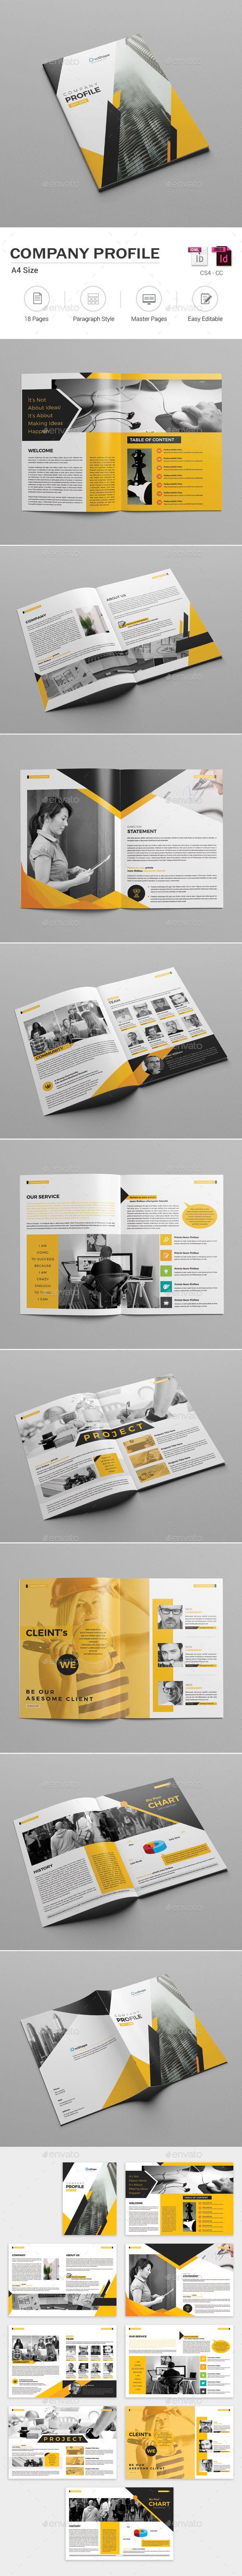 Company #Profile - Corporate #Brochures Download here: https://graphicriver.net/item/company-profile/19560552?ref=alena994